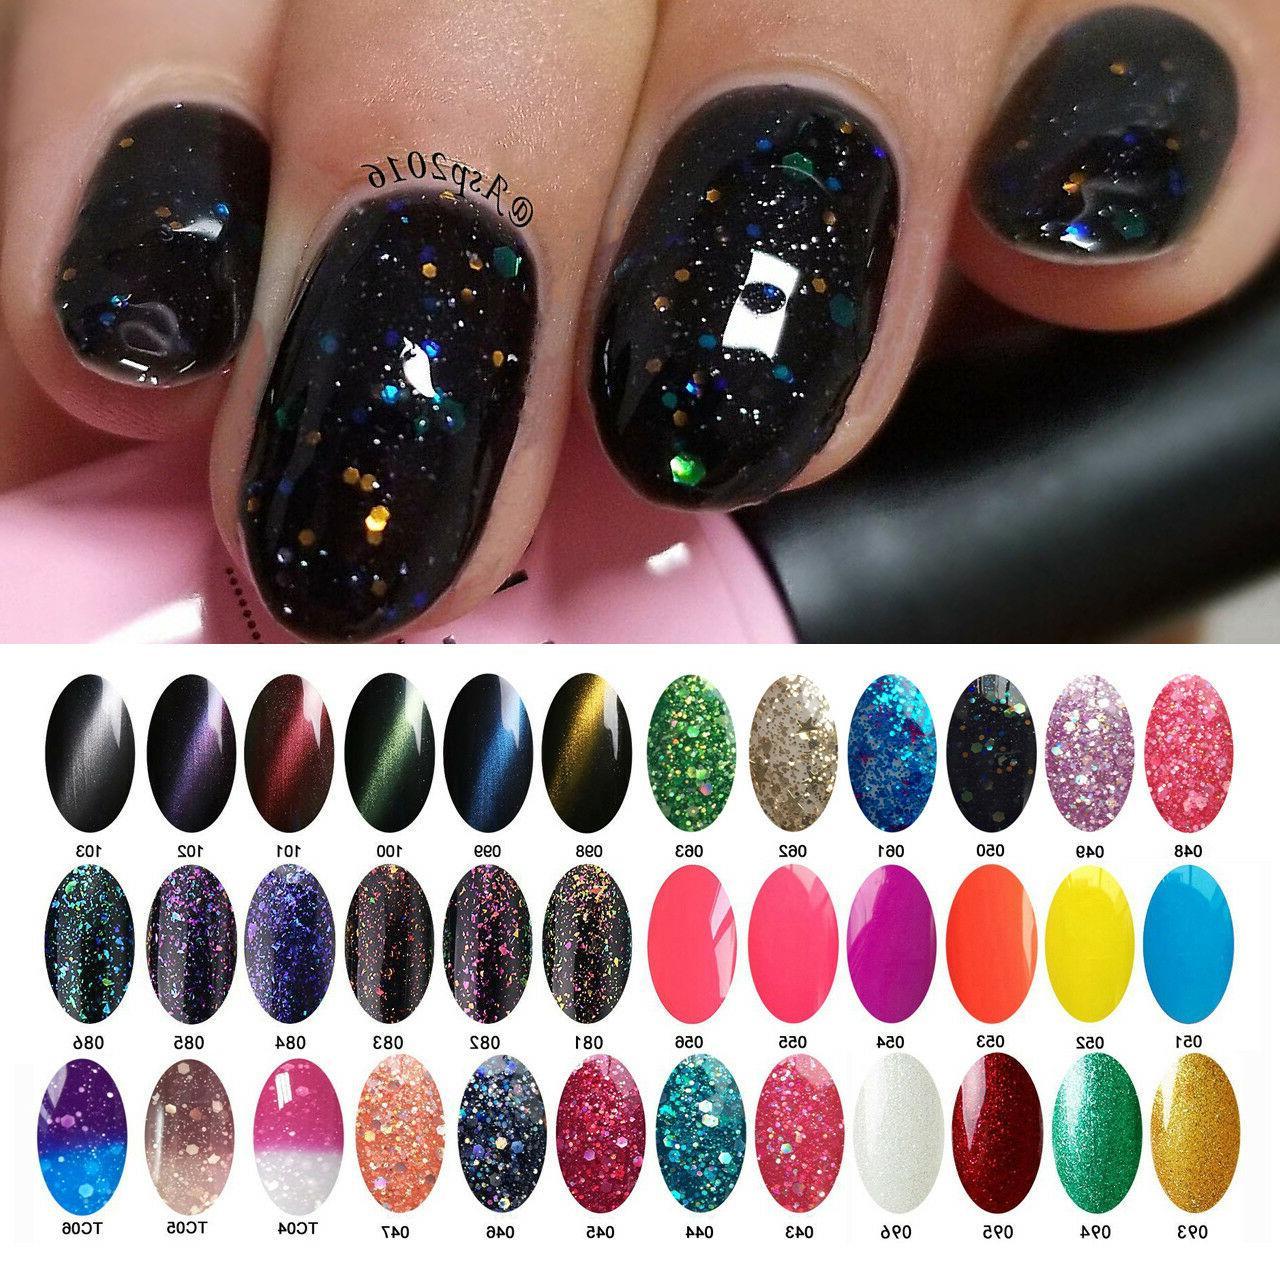 6 PCS AIMEILI Colorful Soak Off UV LED Gel Nail Polish 10ml